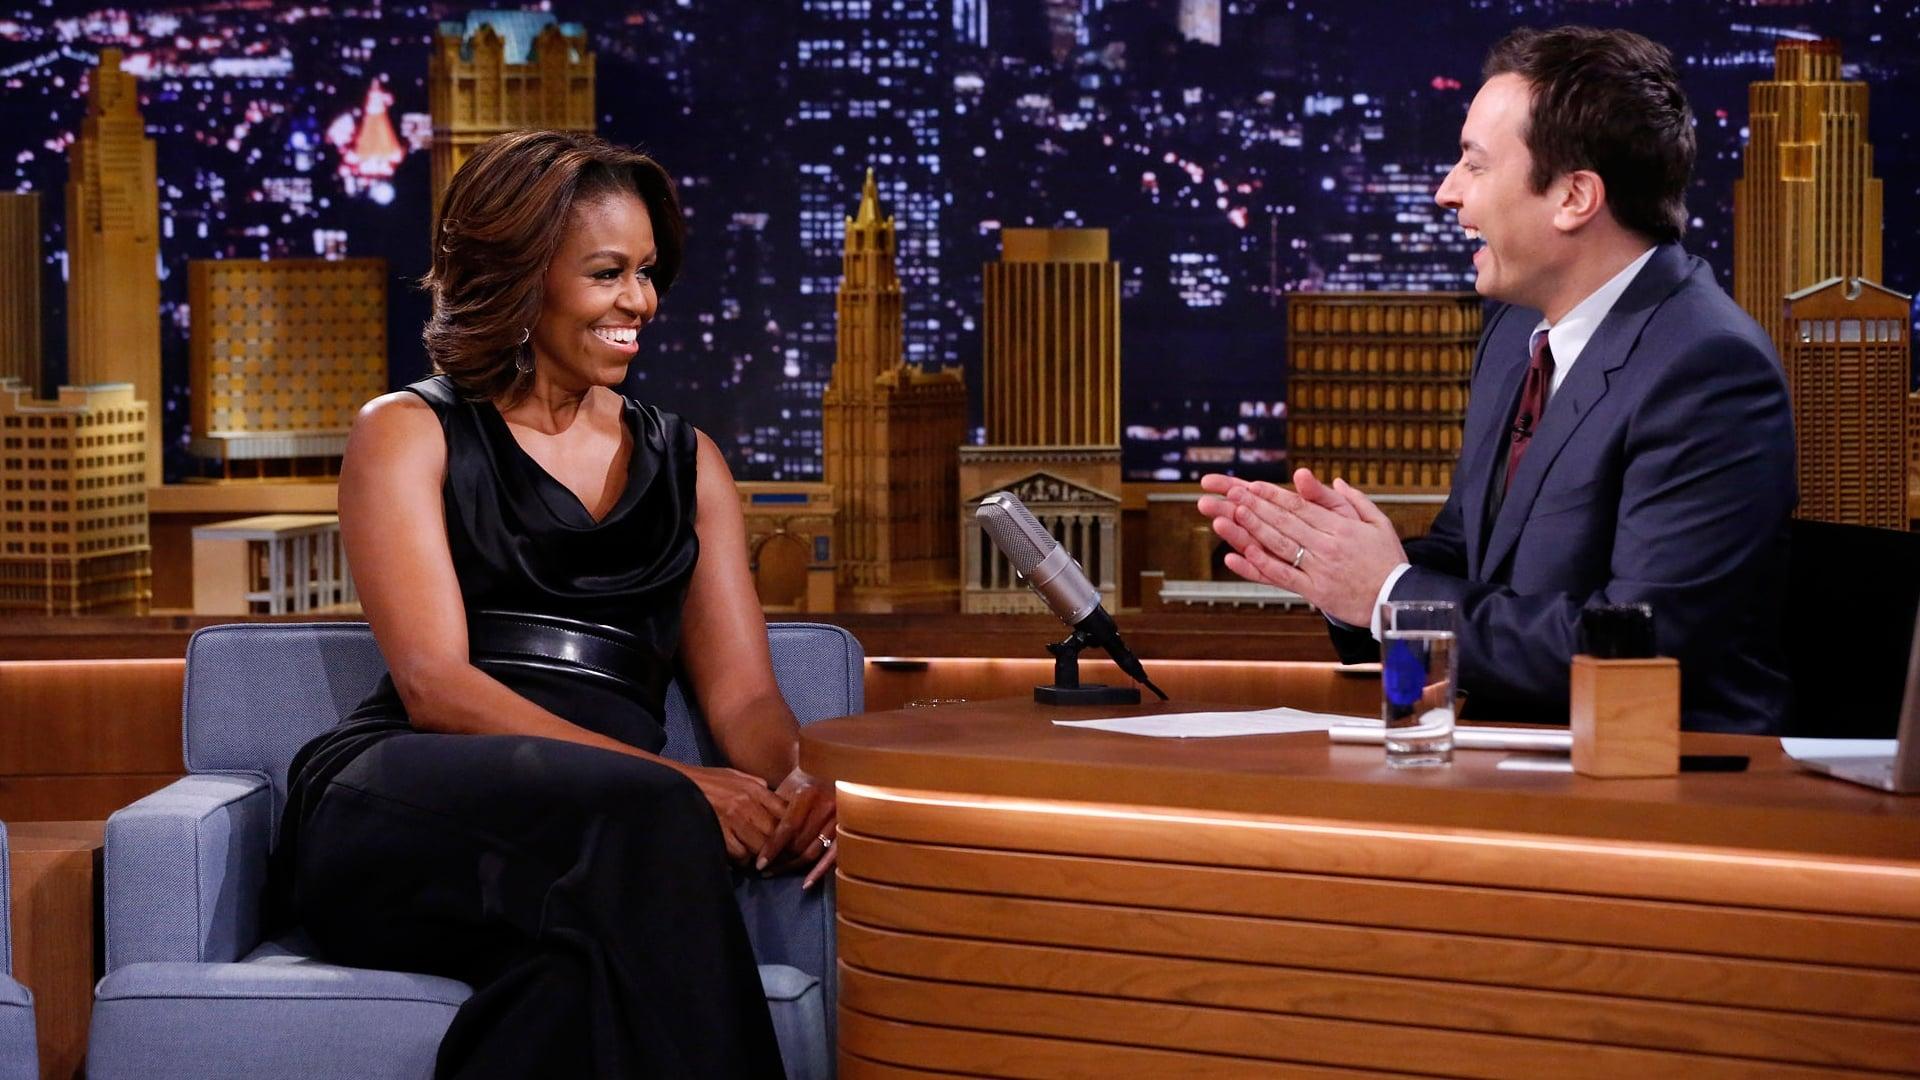 The Tonight Show Starring Jimmy Fallon Season 1 :Episode 4  Michelle Obama, Will Ferrell, Arcade Fire